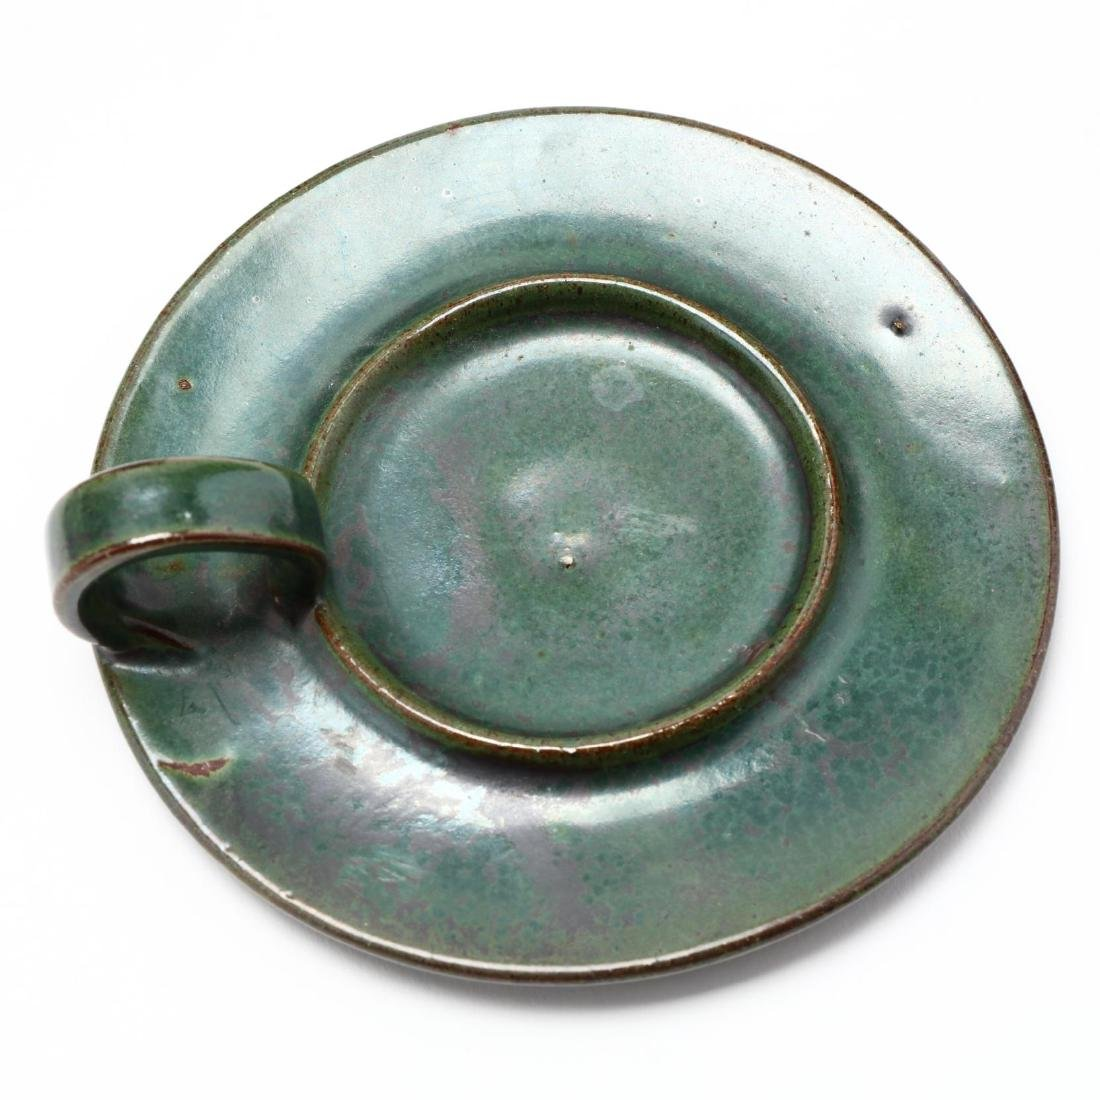 A Group of North Carolina Pottery - 5